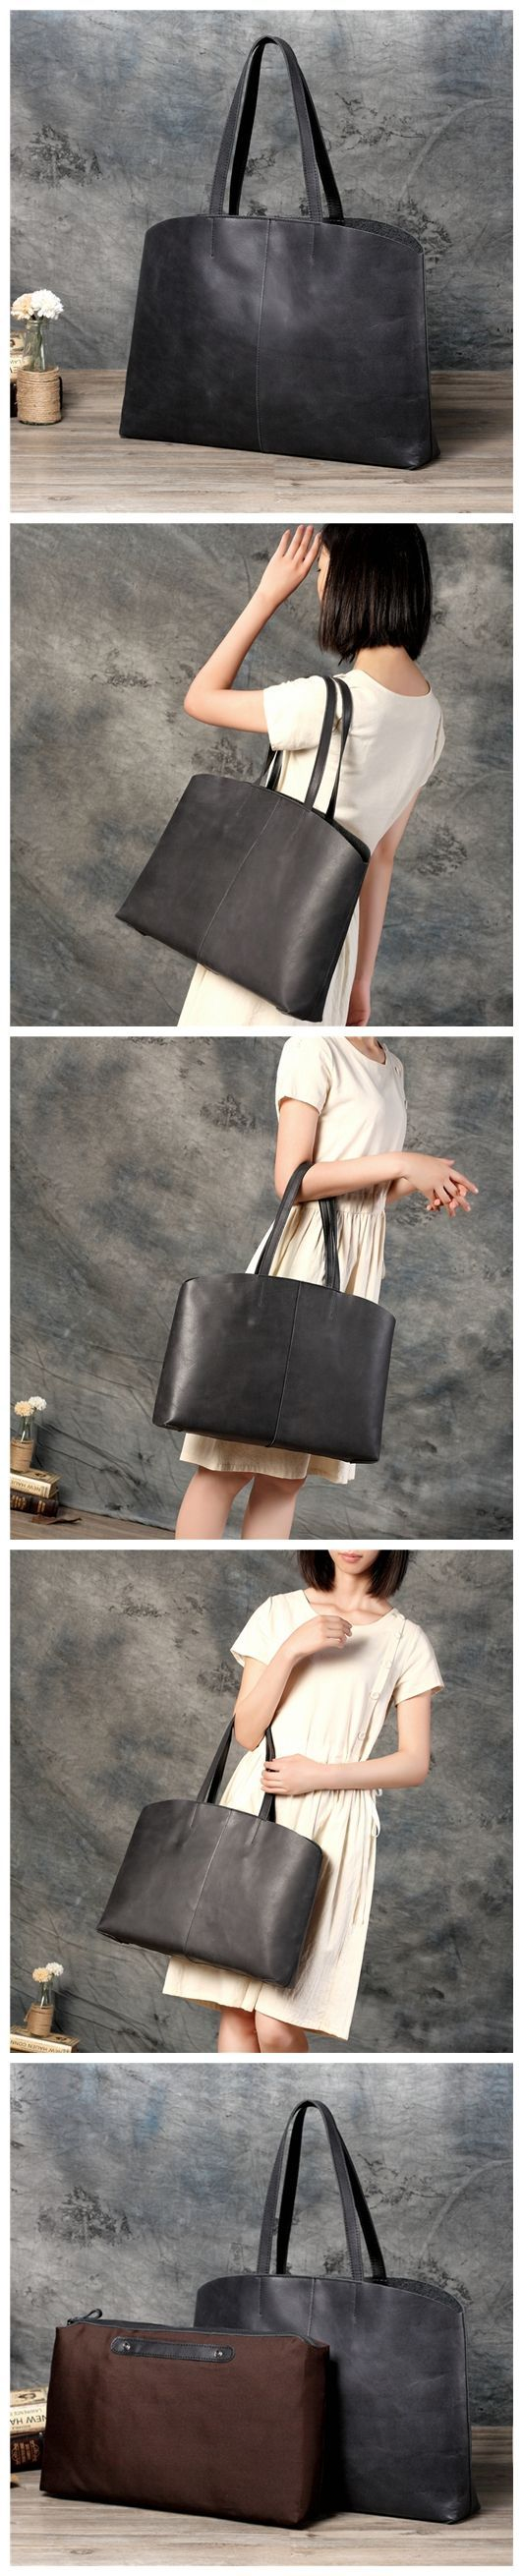 WOMEN TOTE, SHOPPING BAG, WOMEN FASHION, ELEGANT BAG, SHOULDER BAG, CUSTOM ORDER, LEATHER DESIGN, LEATHER GOODS FOR WOMEN, LEATHER IDEAS, LEATHER CASE, LEATHER DESIGN, HANDMADE BAG